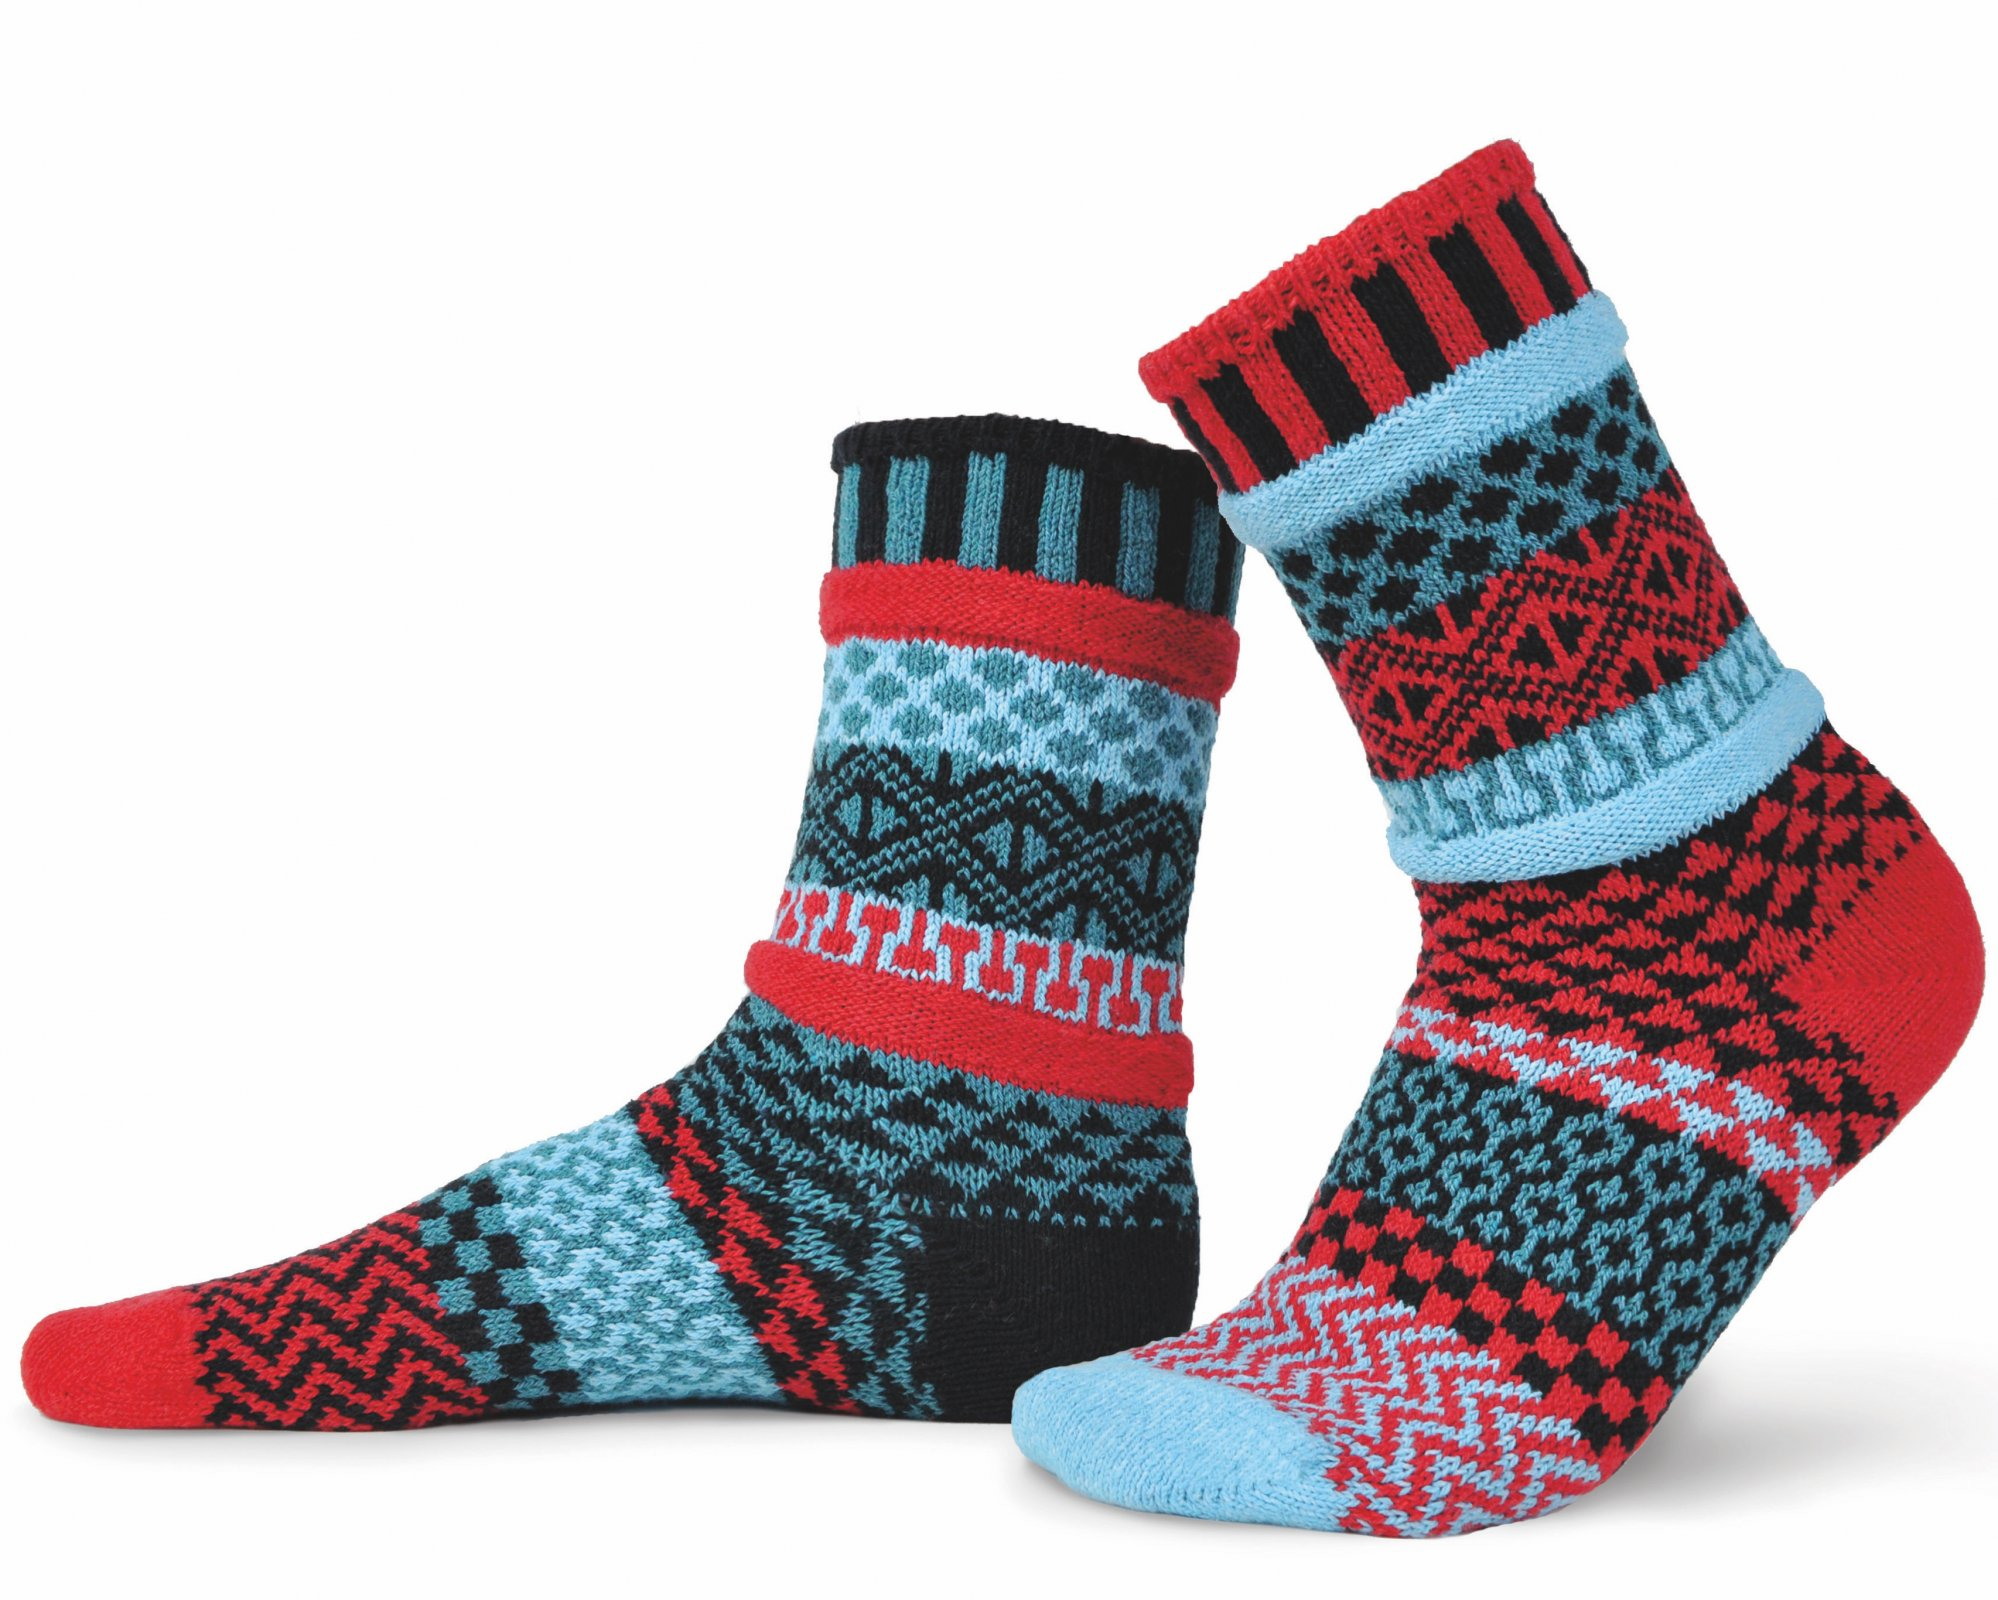 Solmate Crew Socks Mars